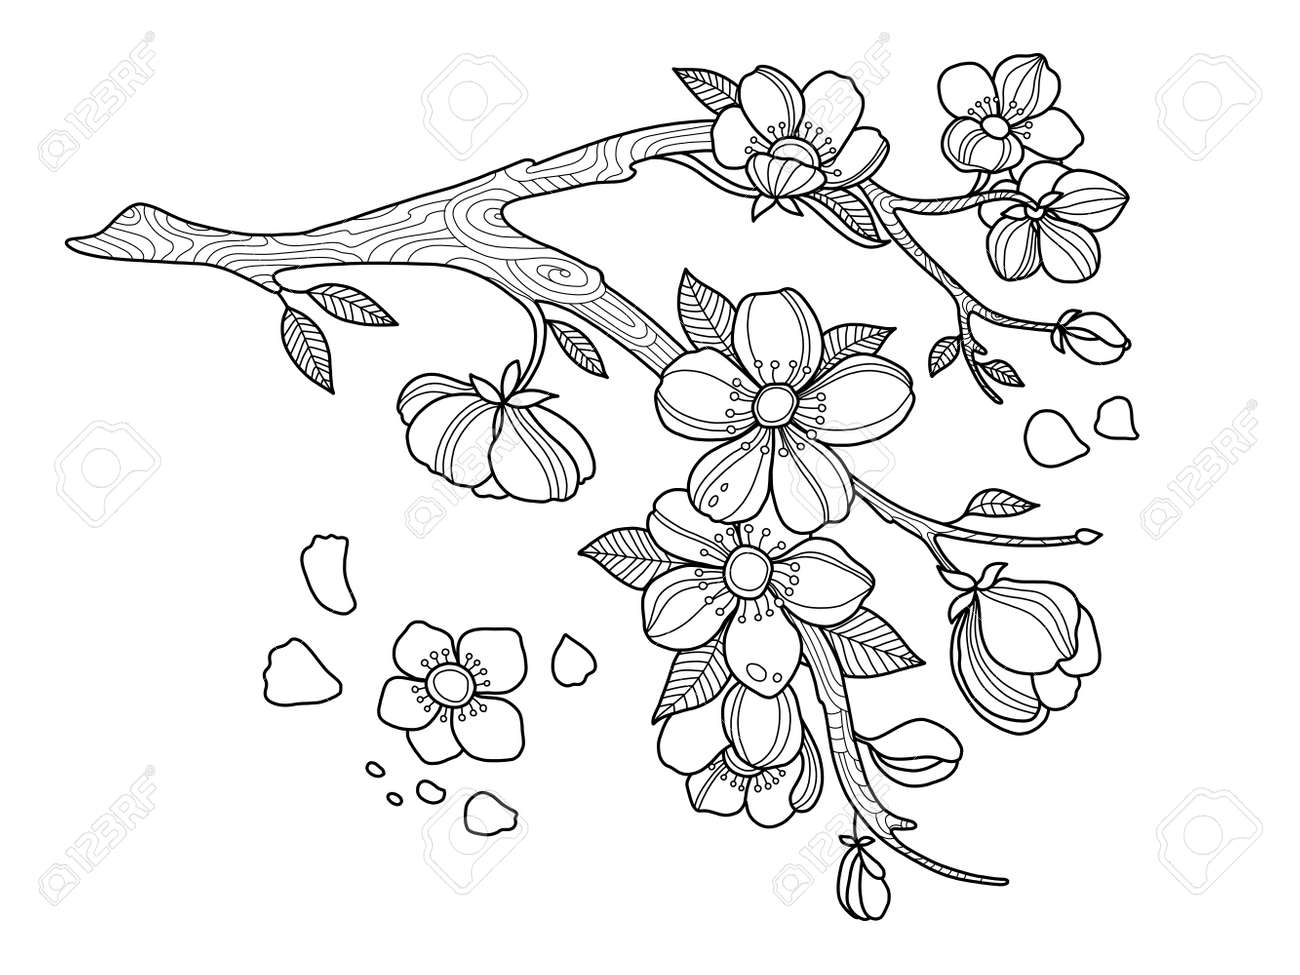 Kirschblüten Malbuch Vektor-Illustration Lizenzfreie Fotos, Bilder ...